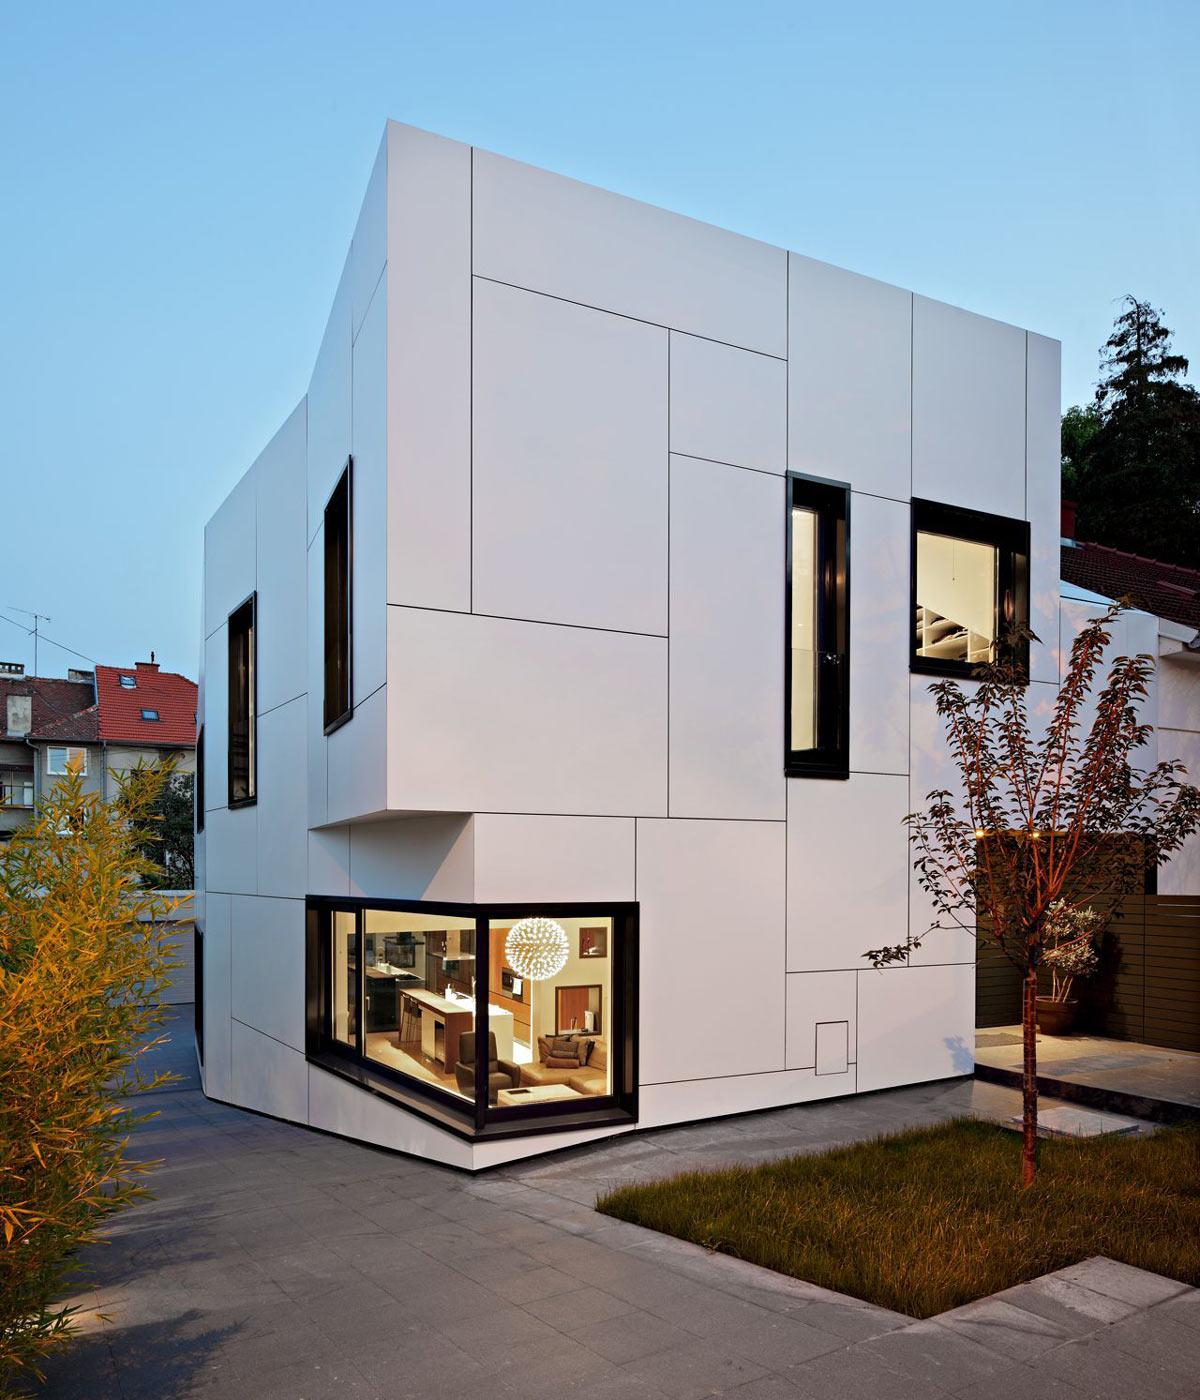 Driveway, A+A House in Zagreb, Croatia by DVA Arhitekta